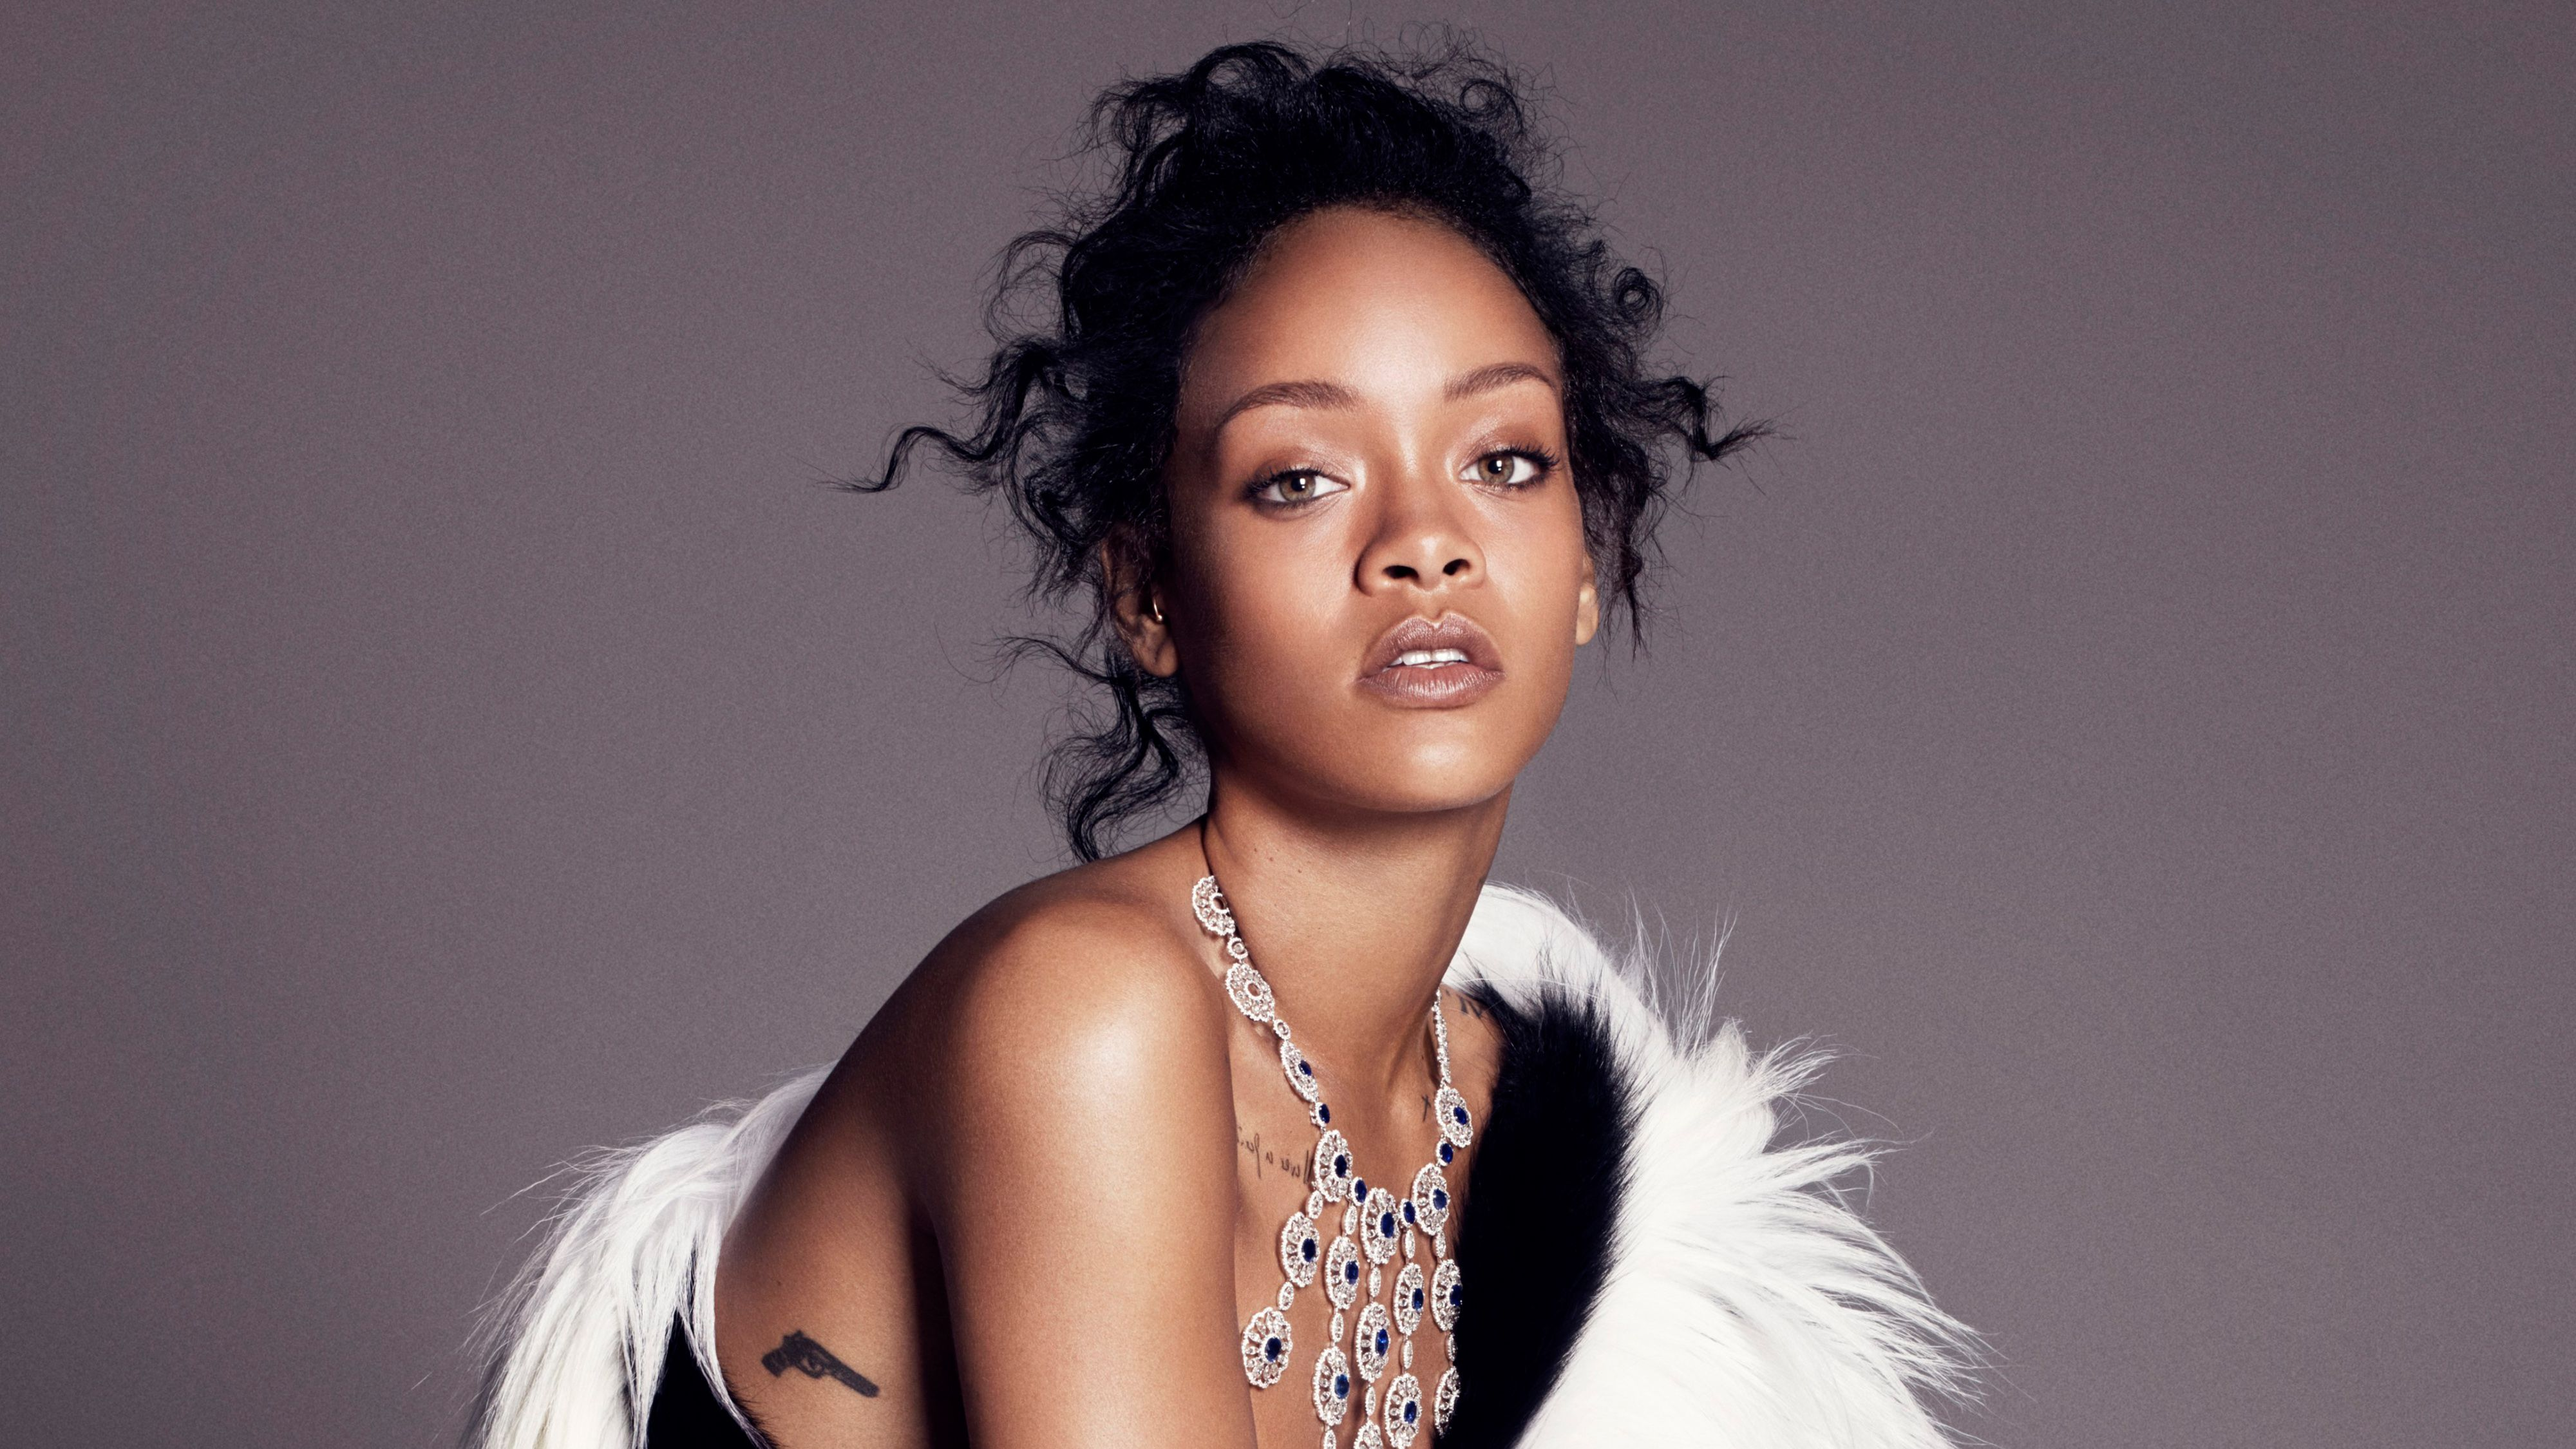 Rihanna 4K Rihanna, Celebrity wallpapers, Laptop wallpaper